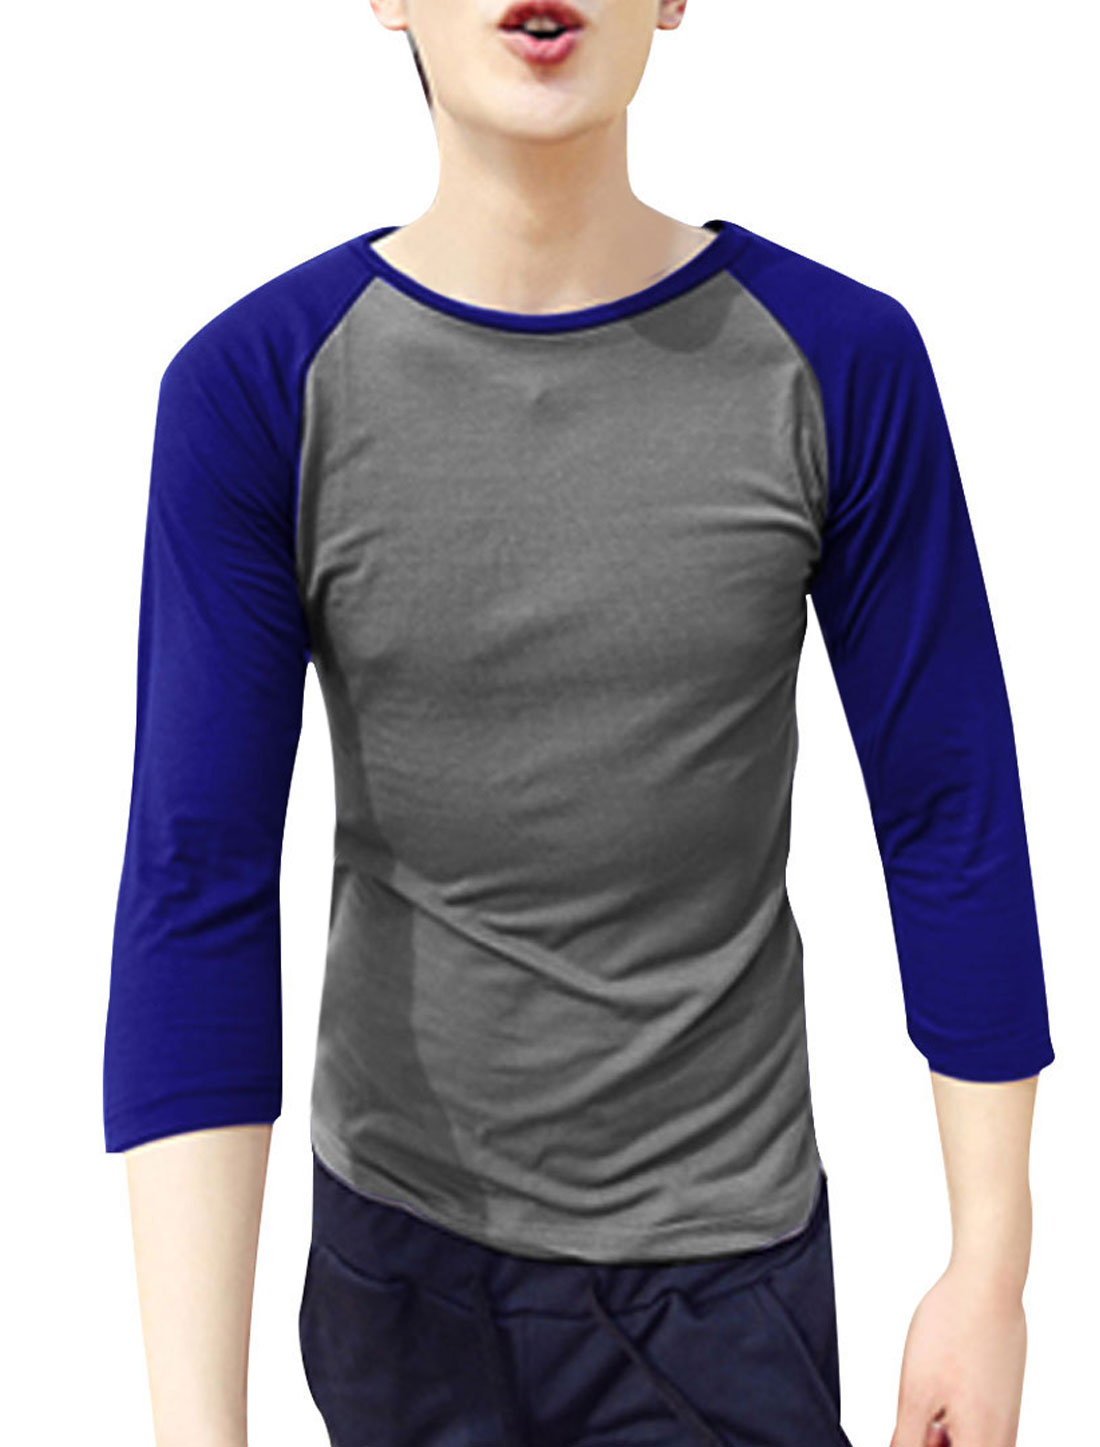 Man Round Neck Raglan Sleeve Color Contrast Chic Tops Shirt Gray M